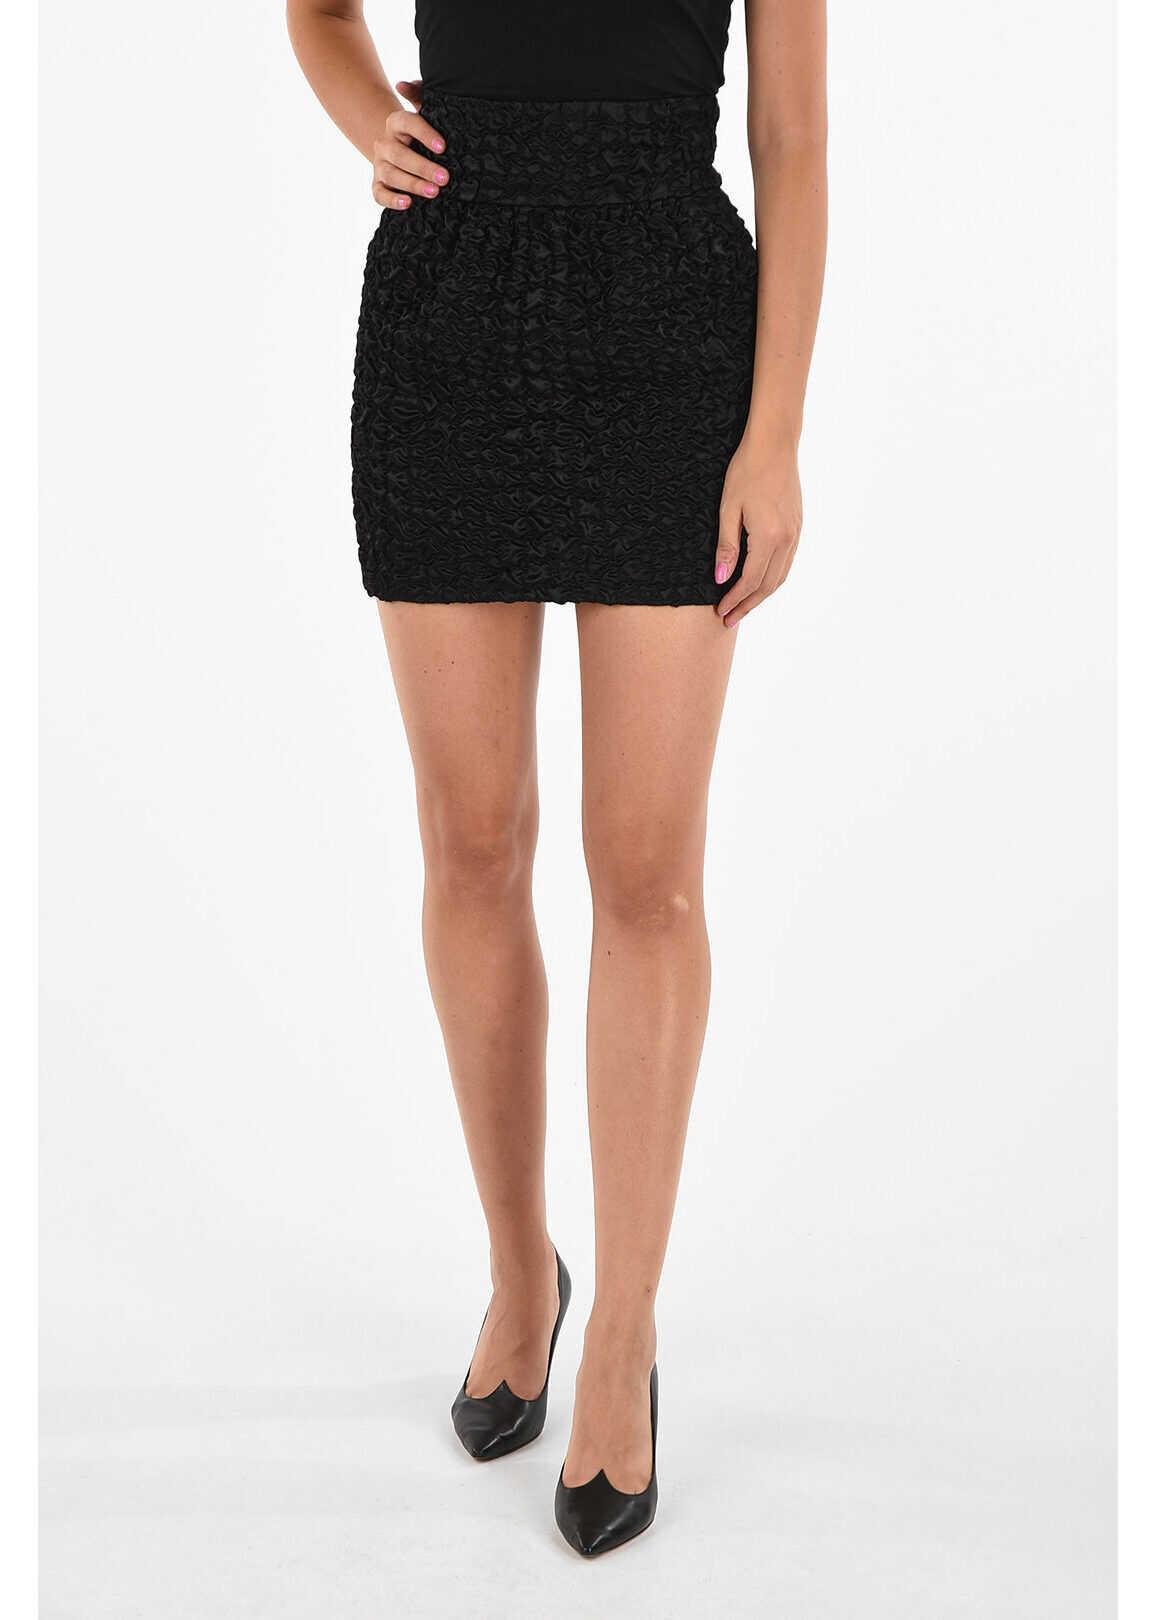 Saint Laurent Ruched Miniskirt BLACK